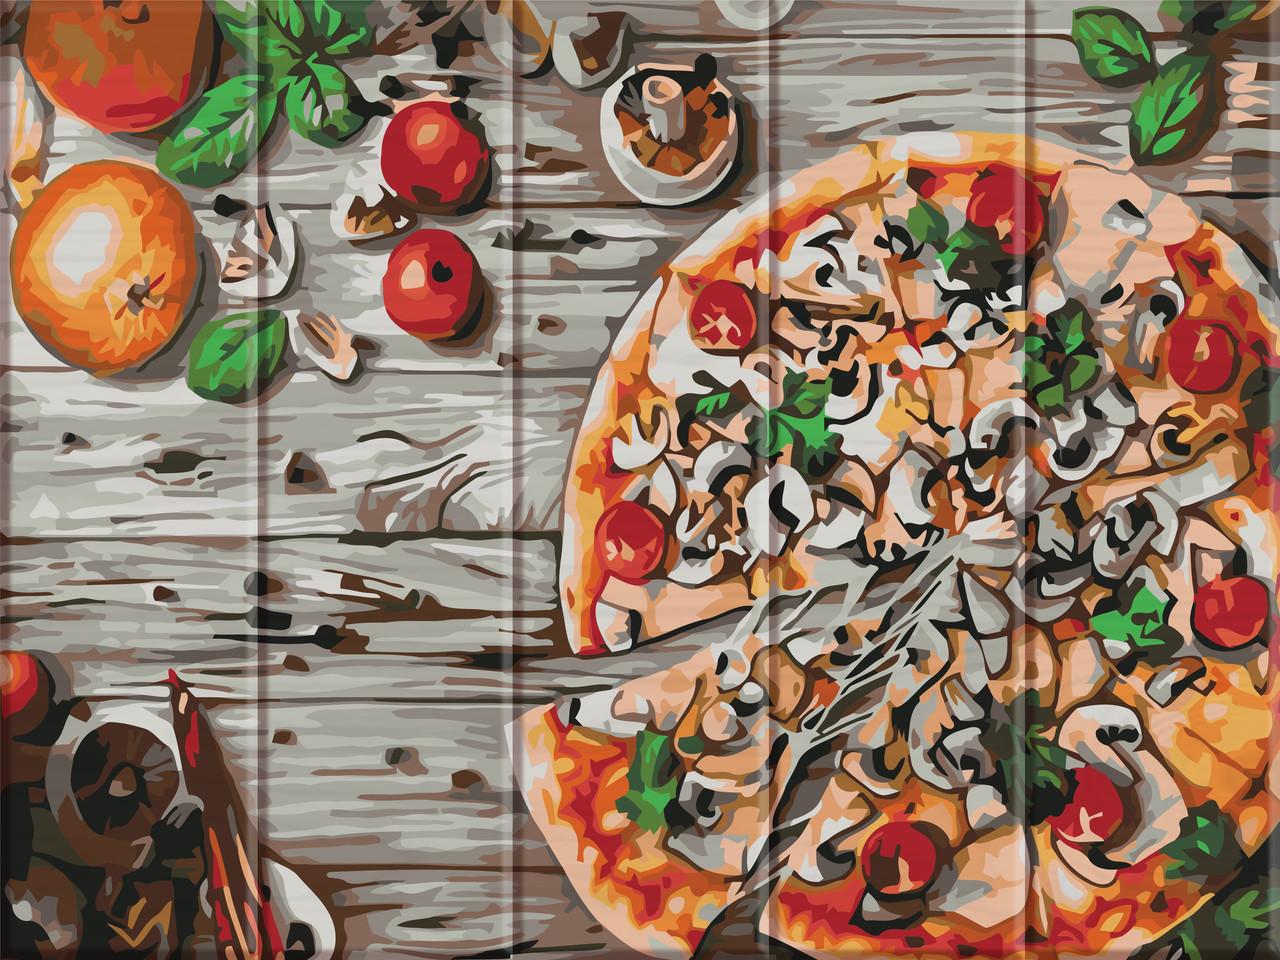 Картина по номерам Піца, 30x40 см., Art Story